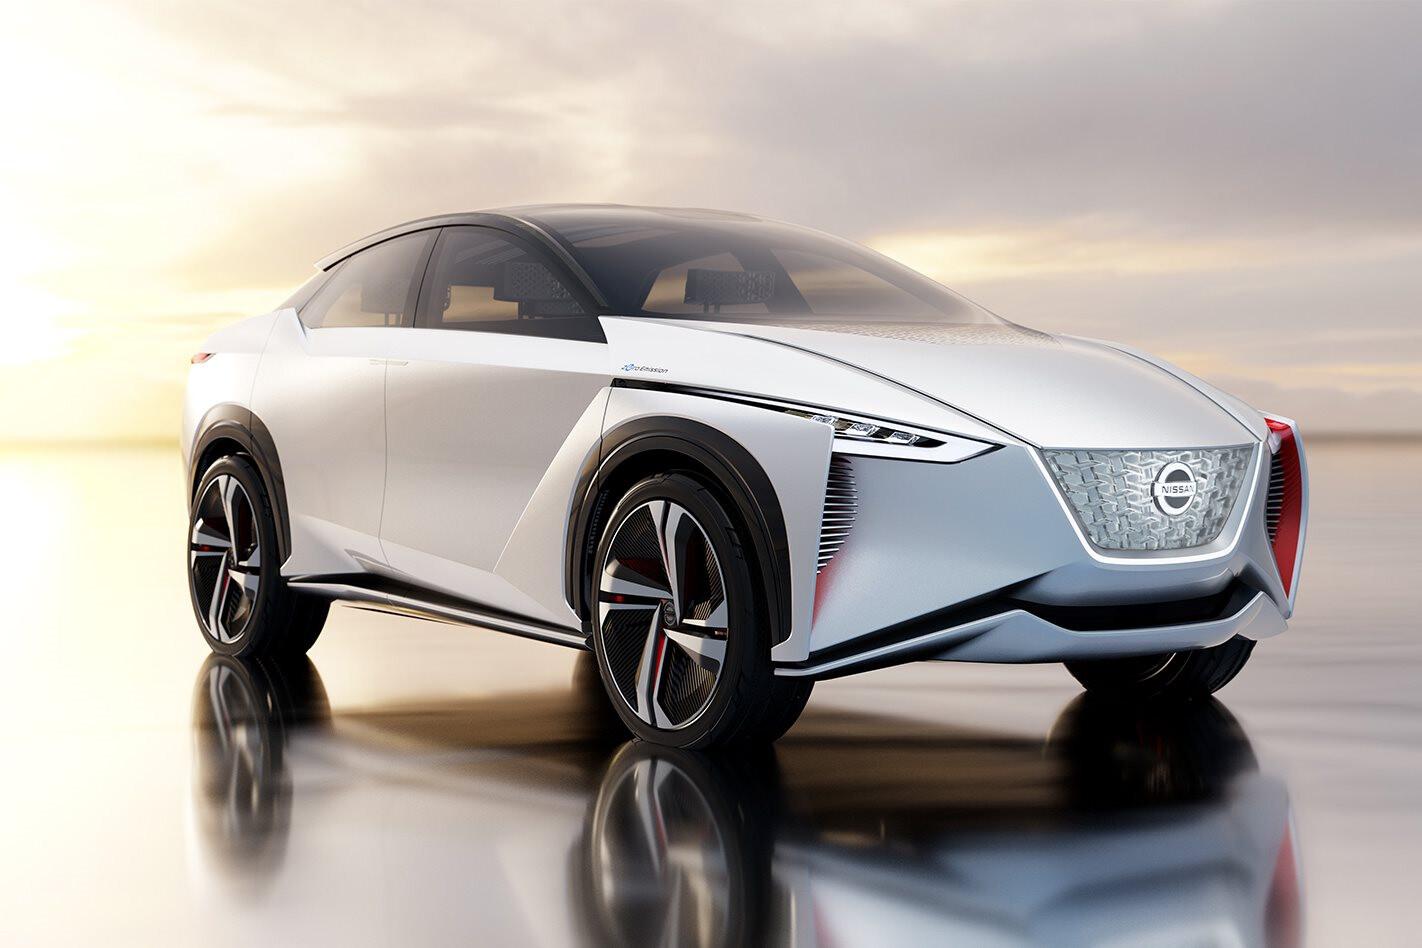 2017 Tokyo Motor Show Nissan IMx concept revealed